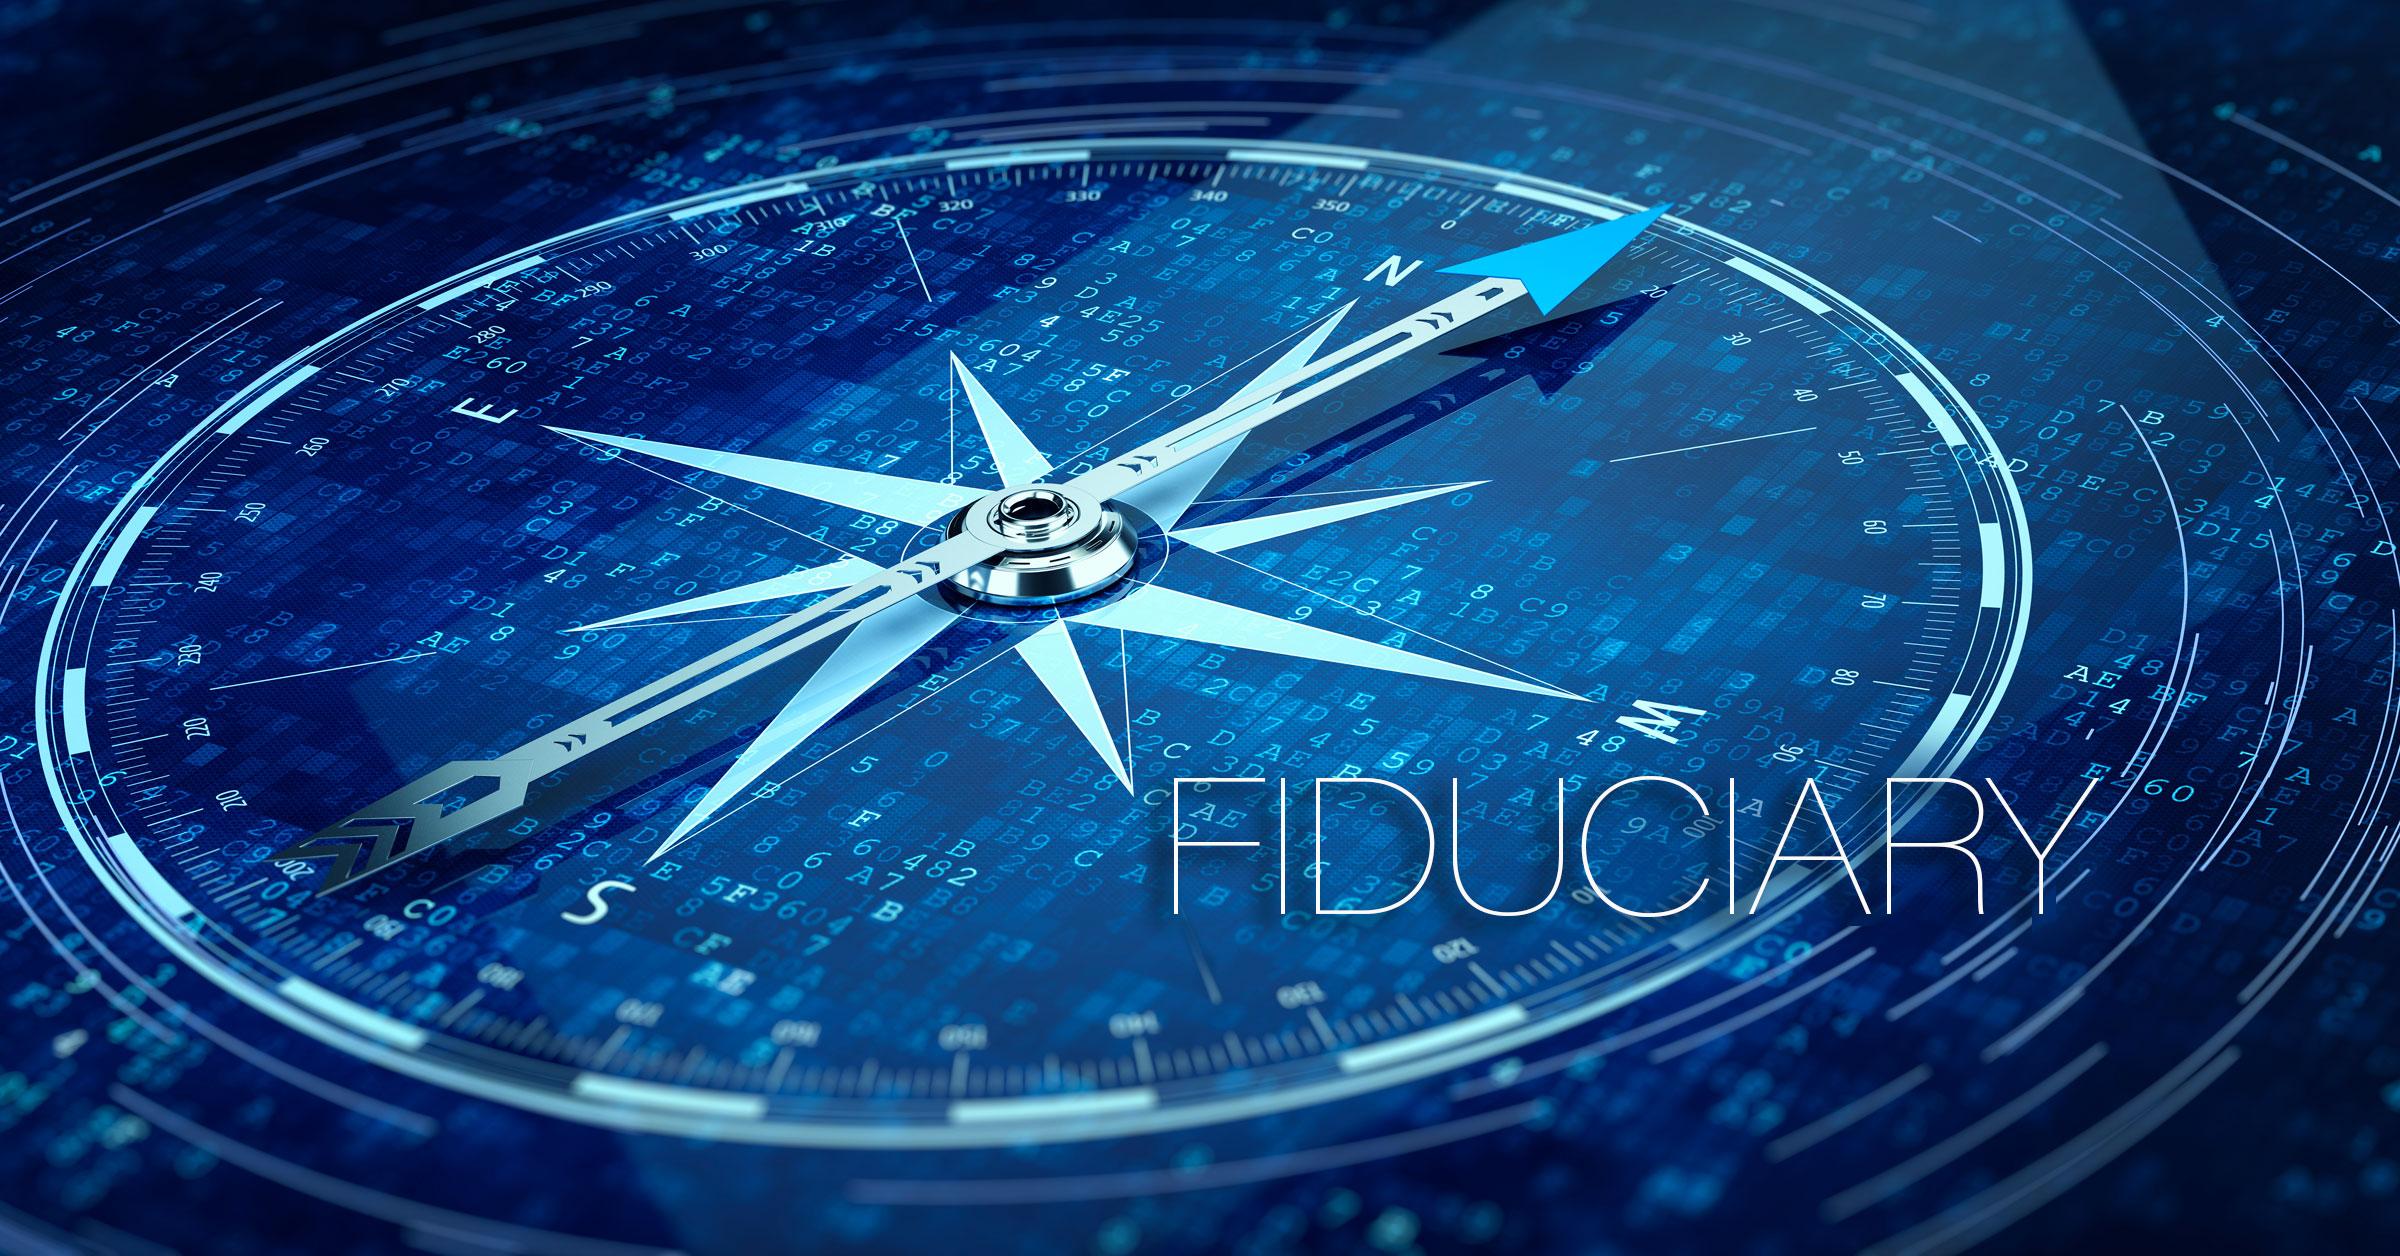 FIDUCIARY